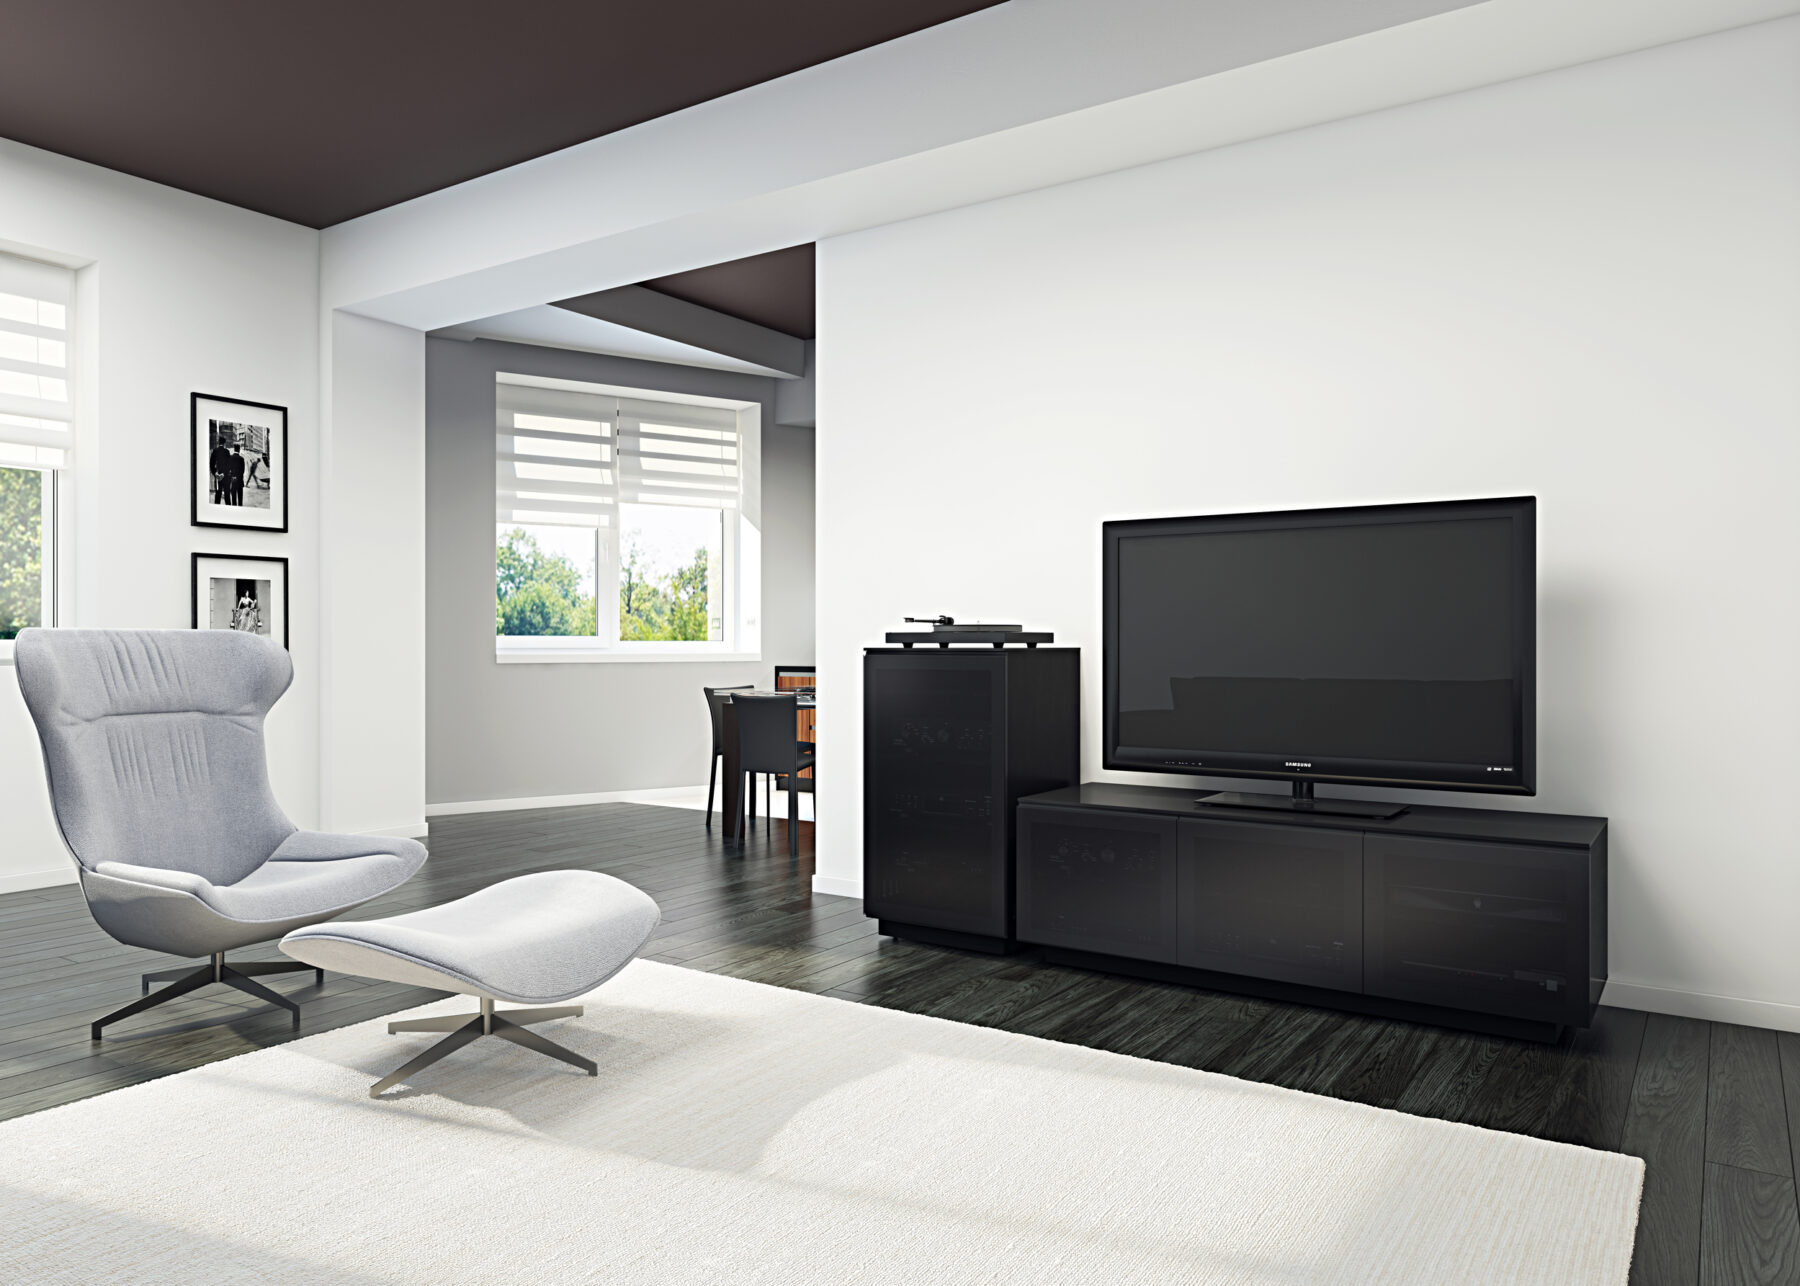 mirage-8227-8222-BDI-media-cabinets-satin-black